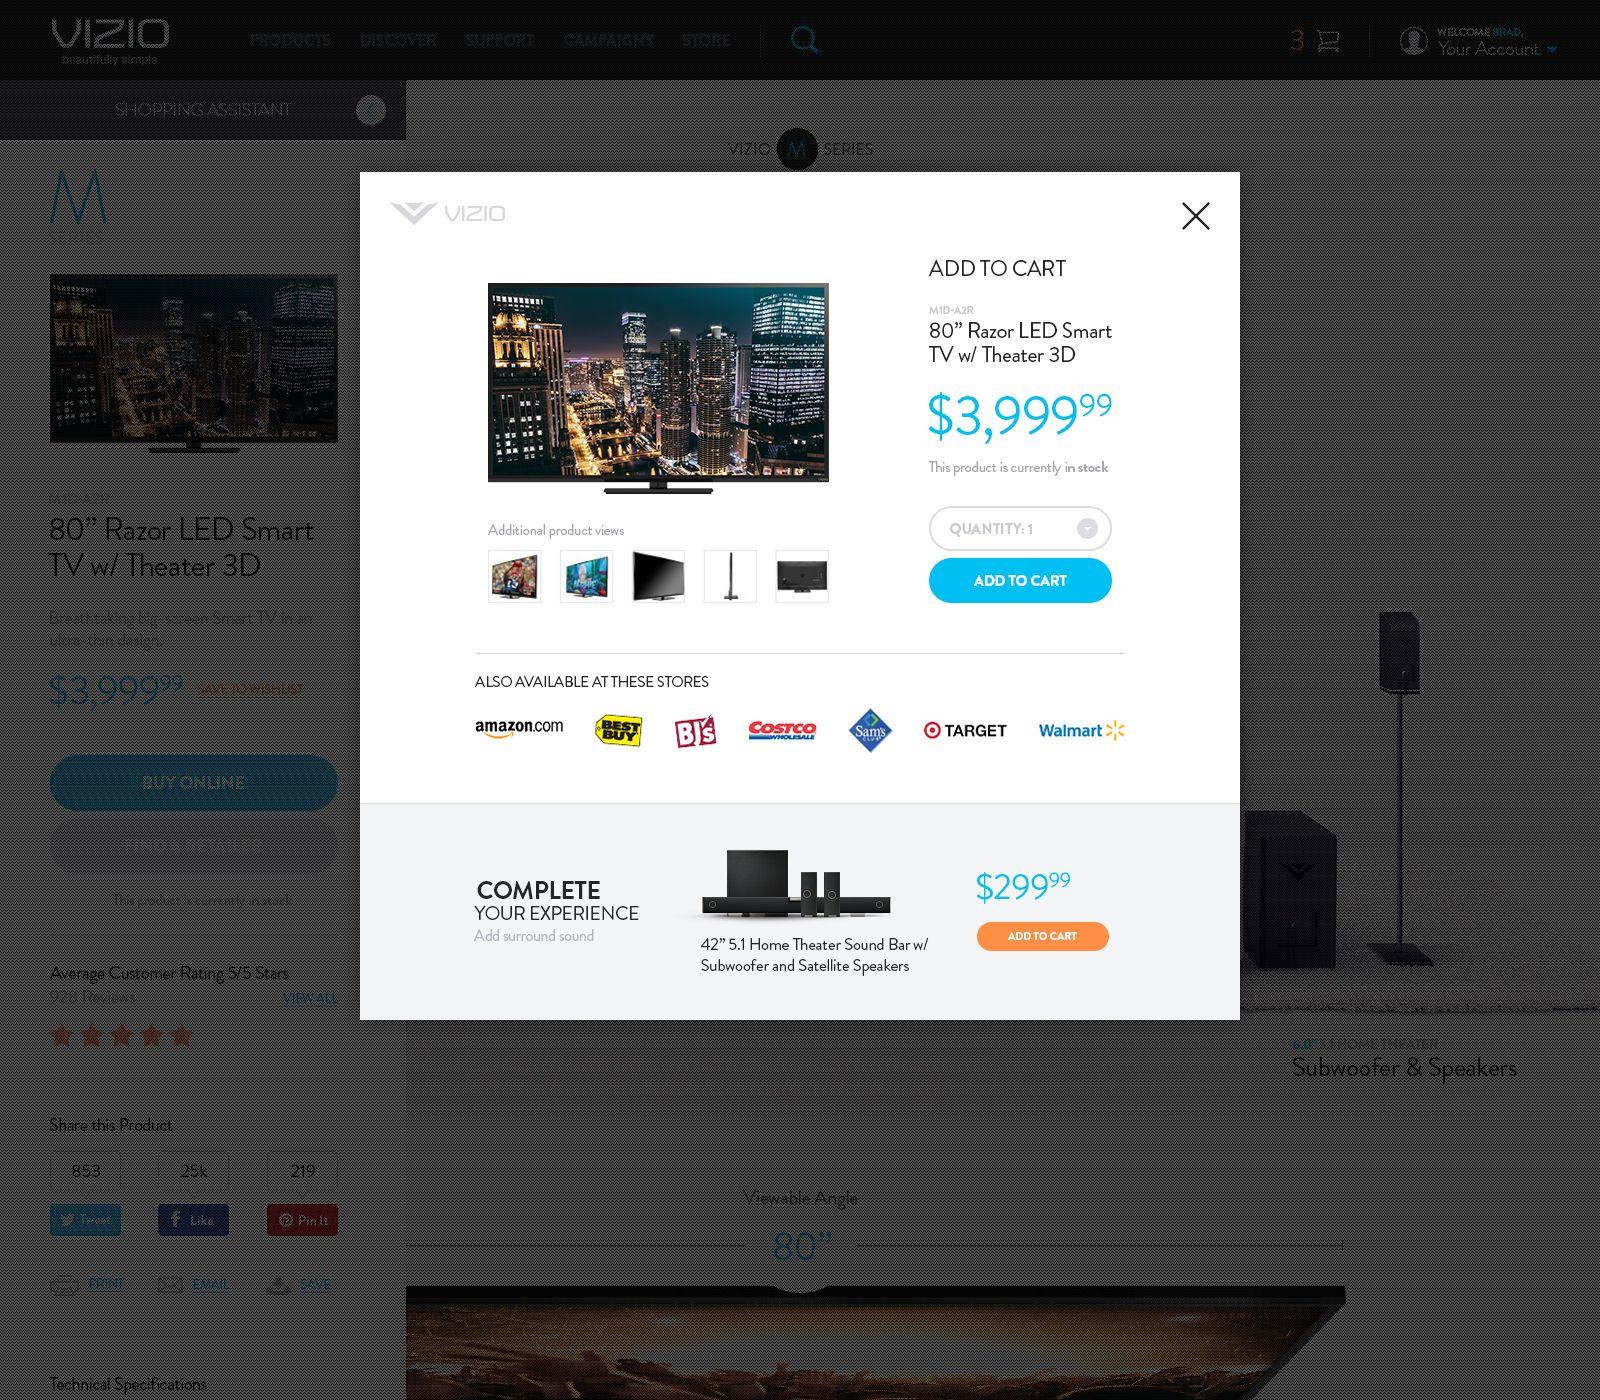 Vizio Add To Cart Fullpixels Jpg By Brad Burke Website Design Inspiration Vizio Ads